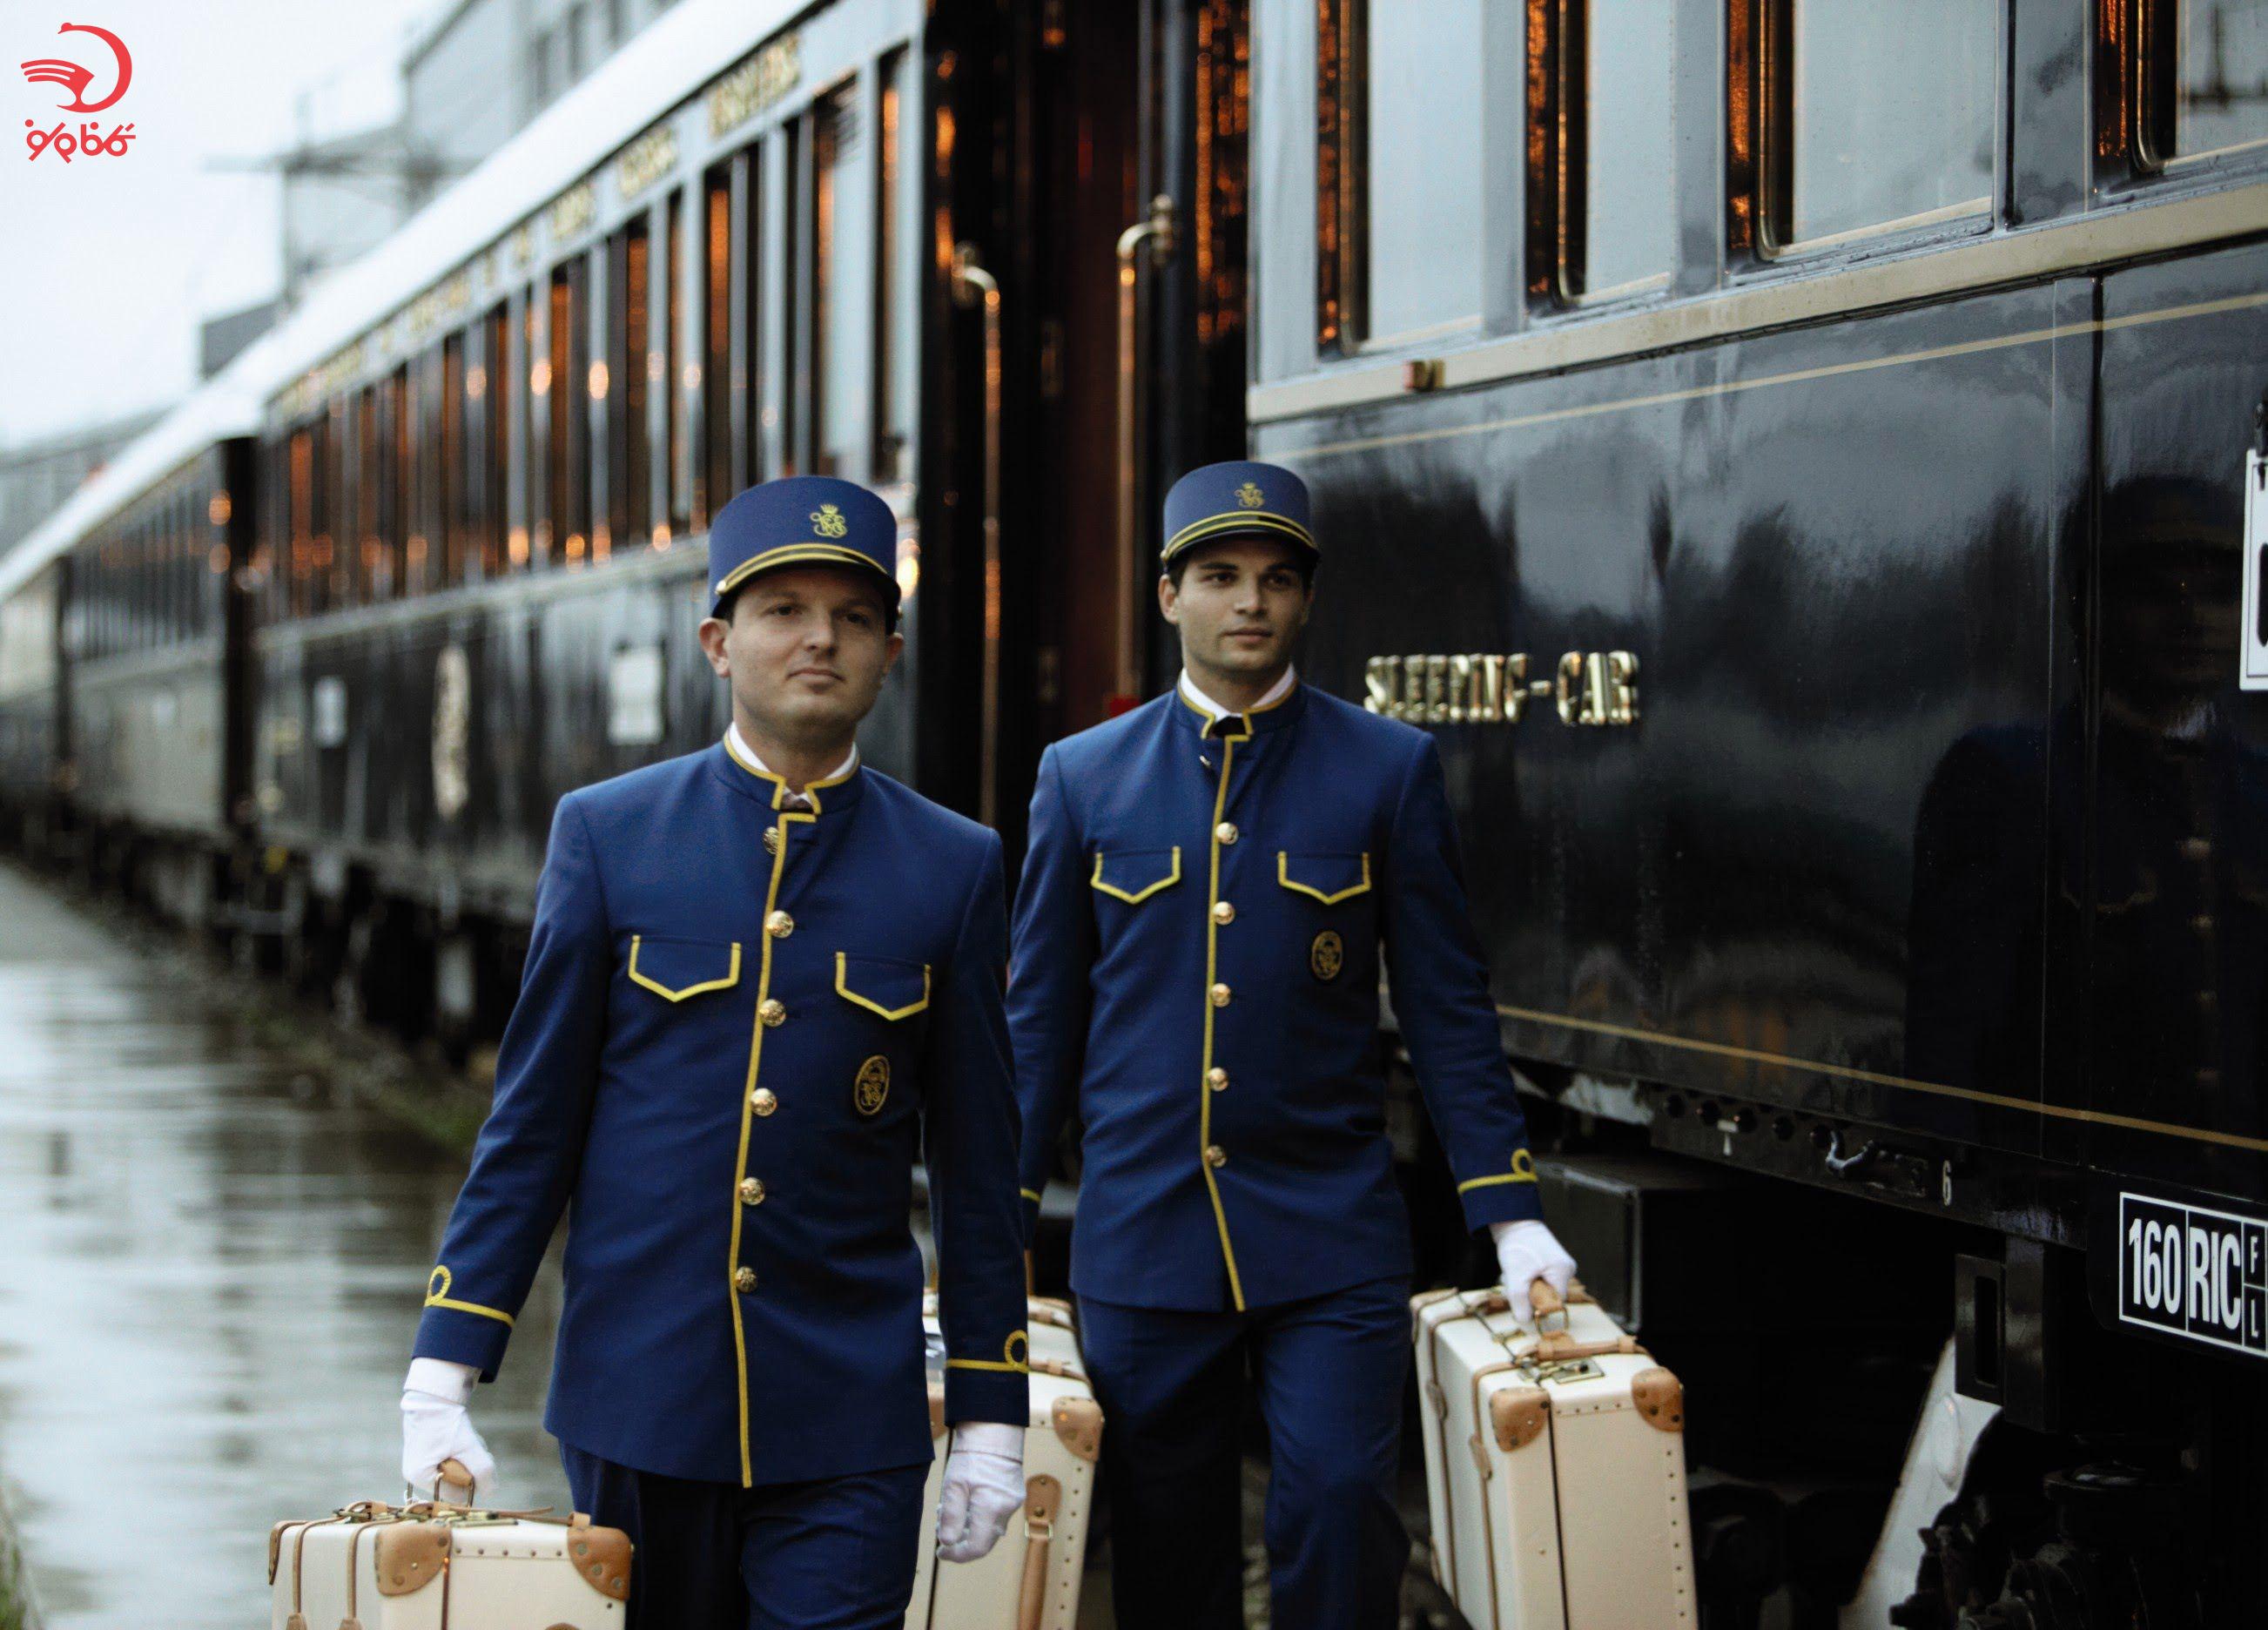 قطار ونیز سیمپلون اوریِنت اکسپرس